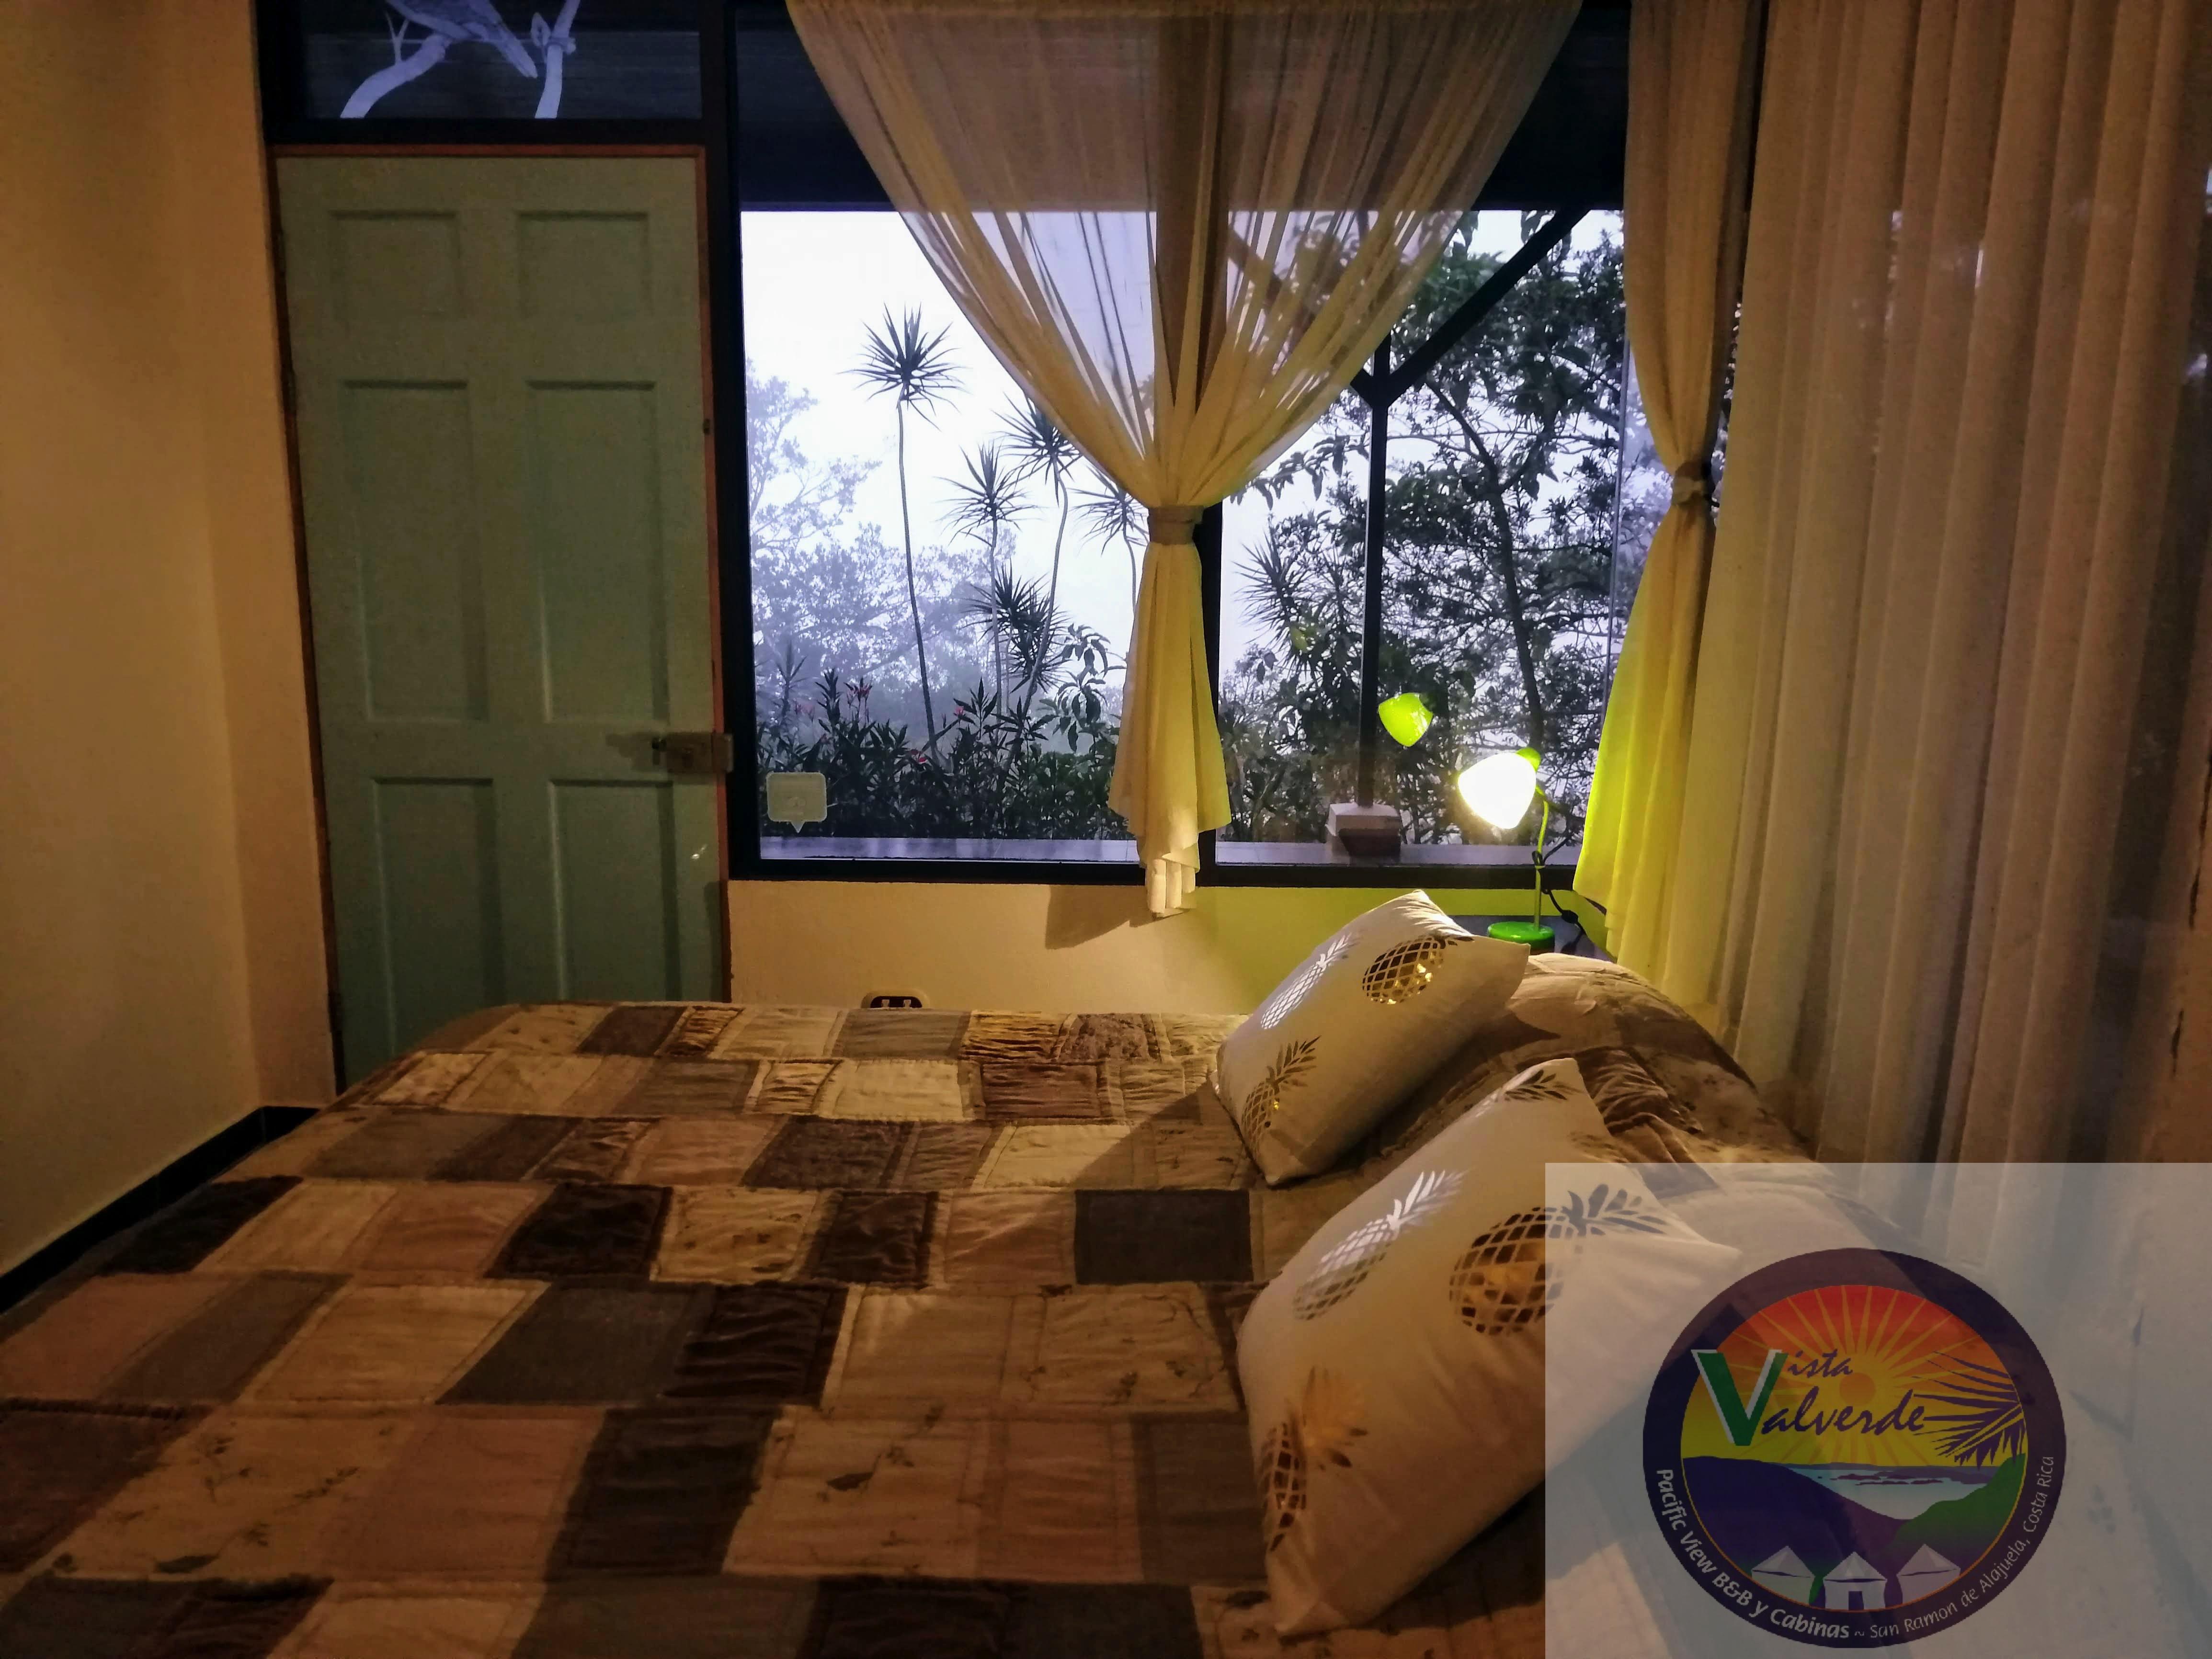 Lovely guest rooms vista valvede BnB san ramon costa rica